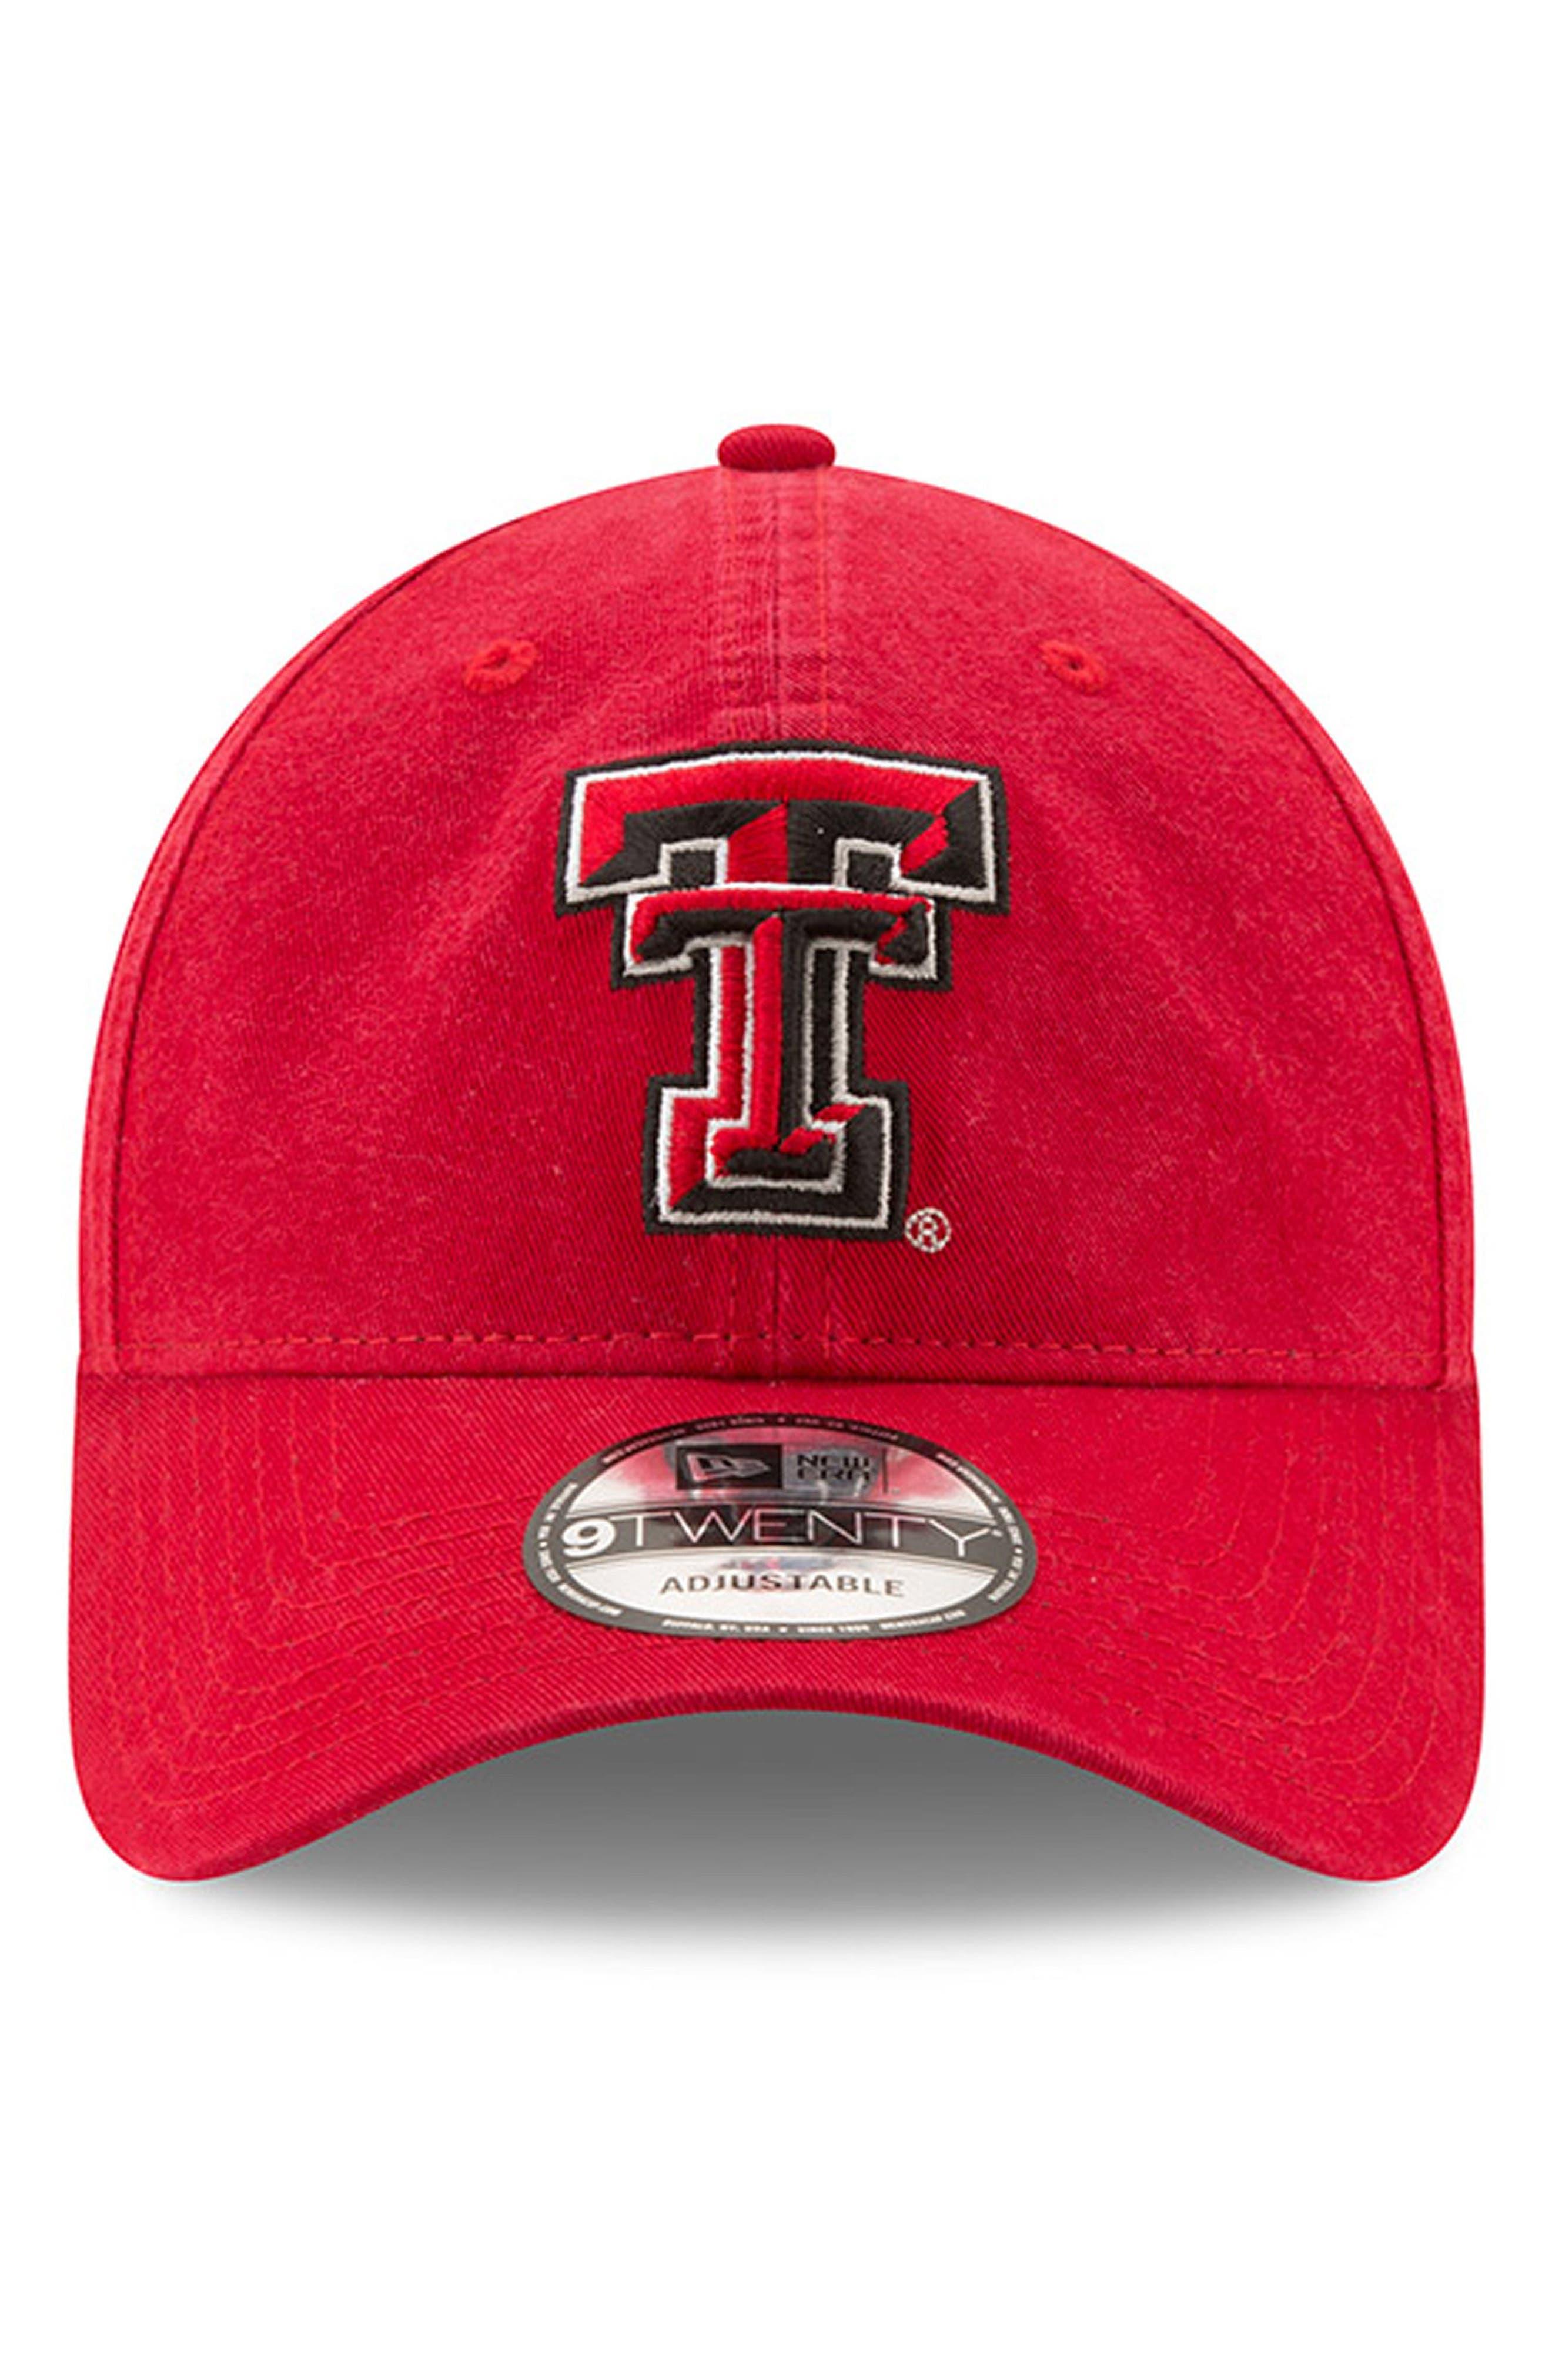 Main Image - New Era Collegiate Core Classic - Texas Tech Red Raiders Baseball Cap